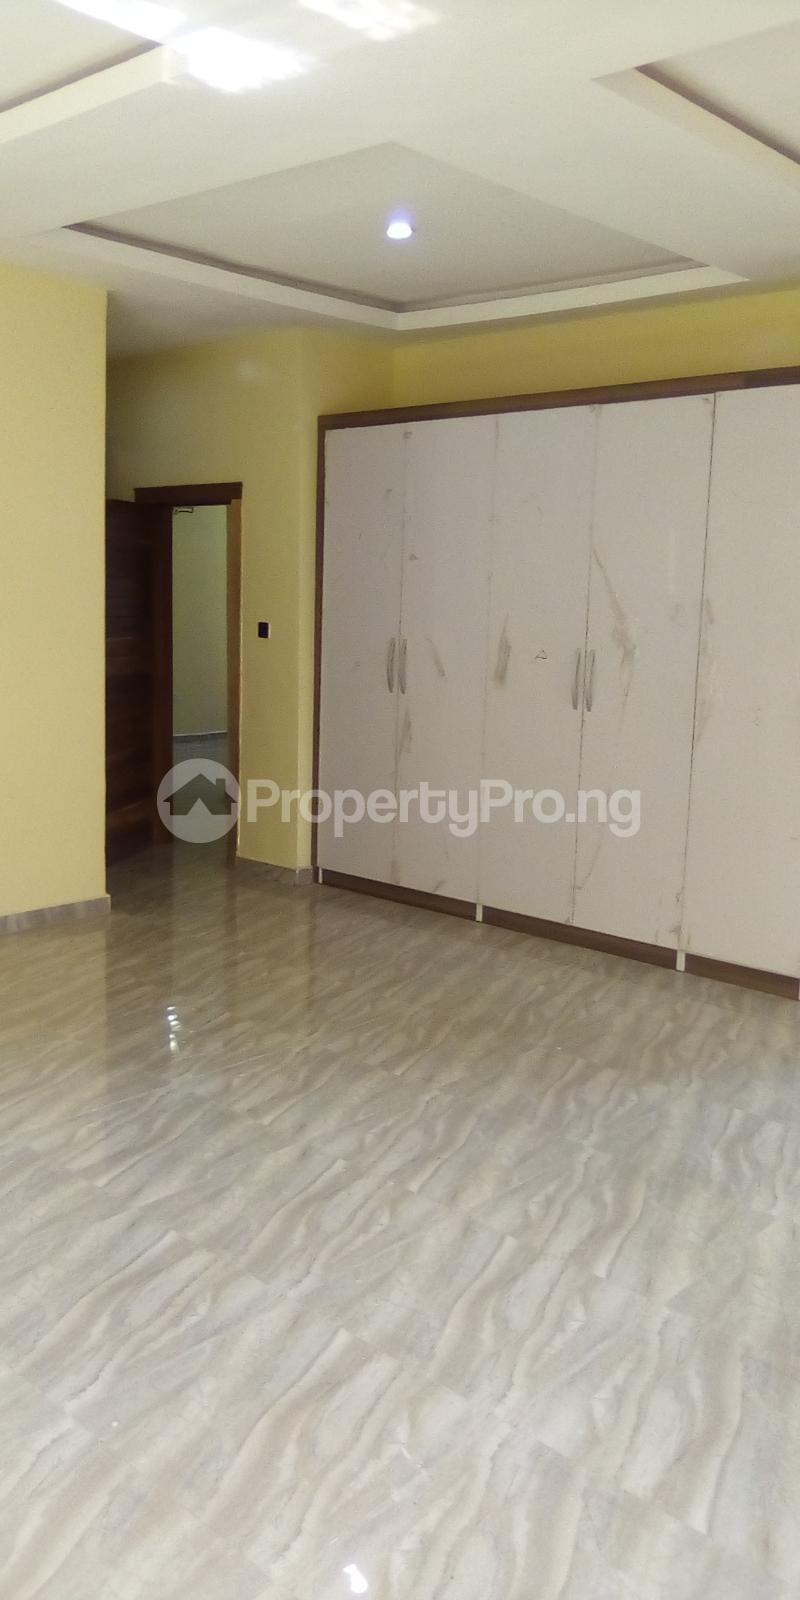 5 bedroom Detached Duplex for sale Southern View Oral Estate Lekki Lagos - 9